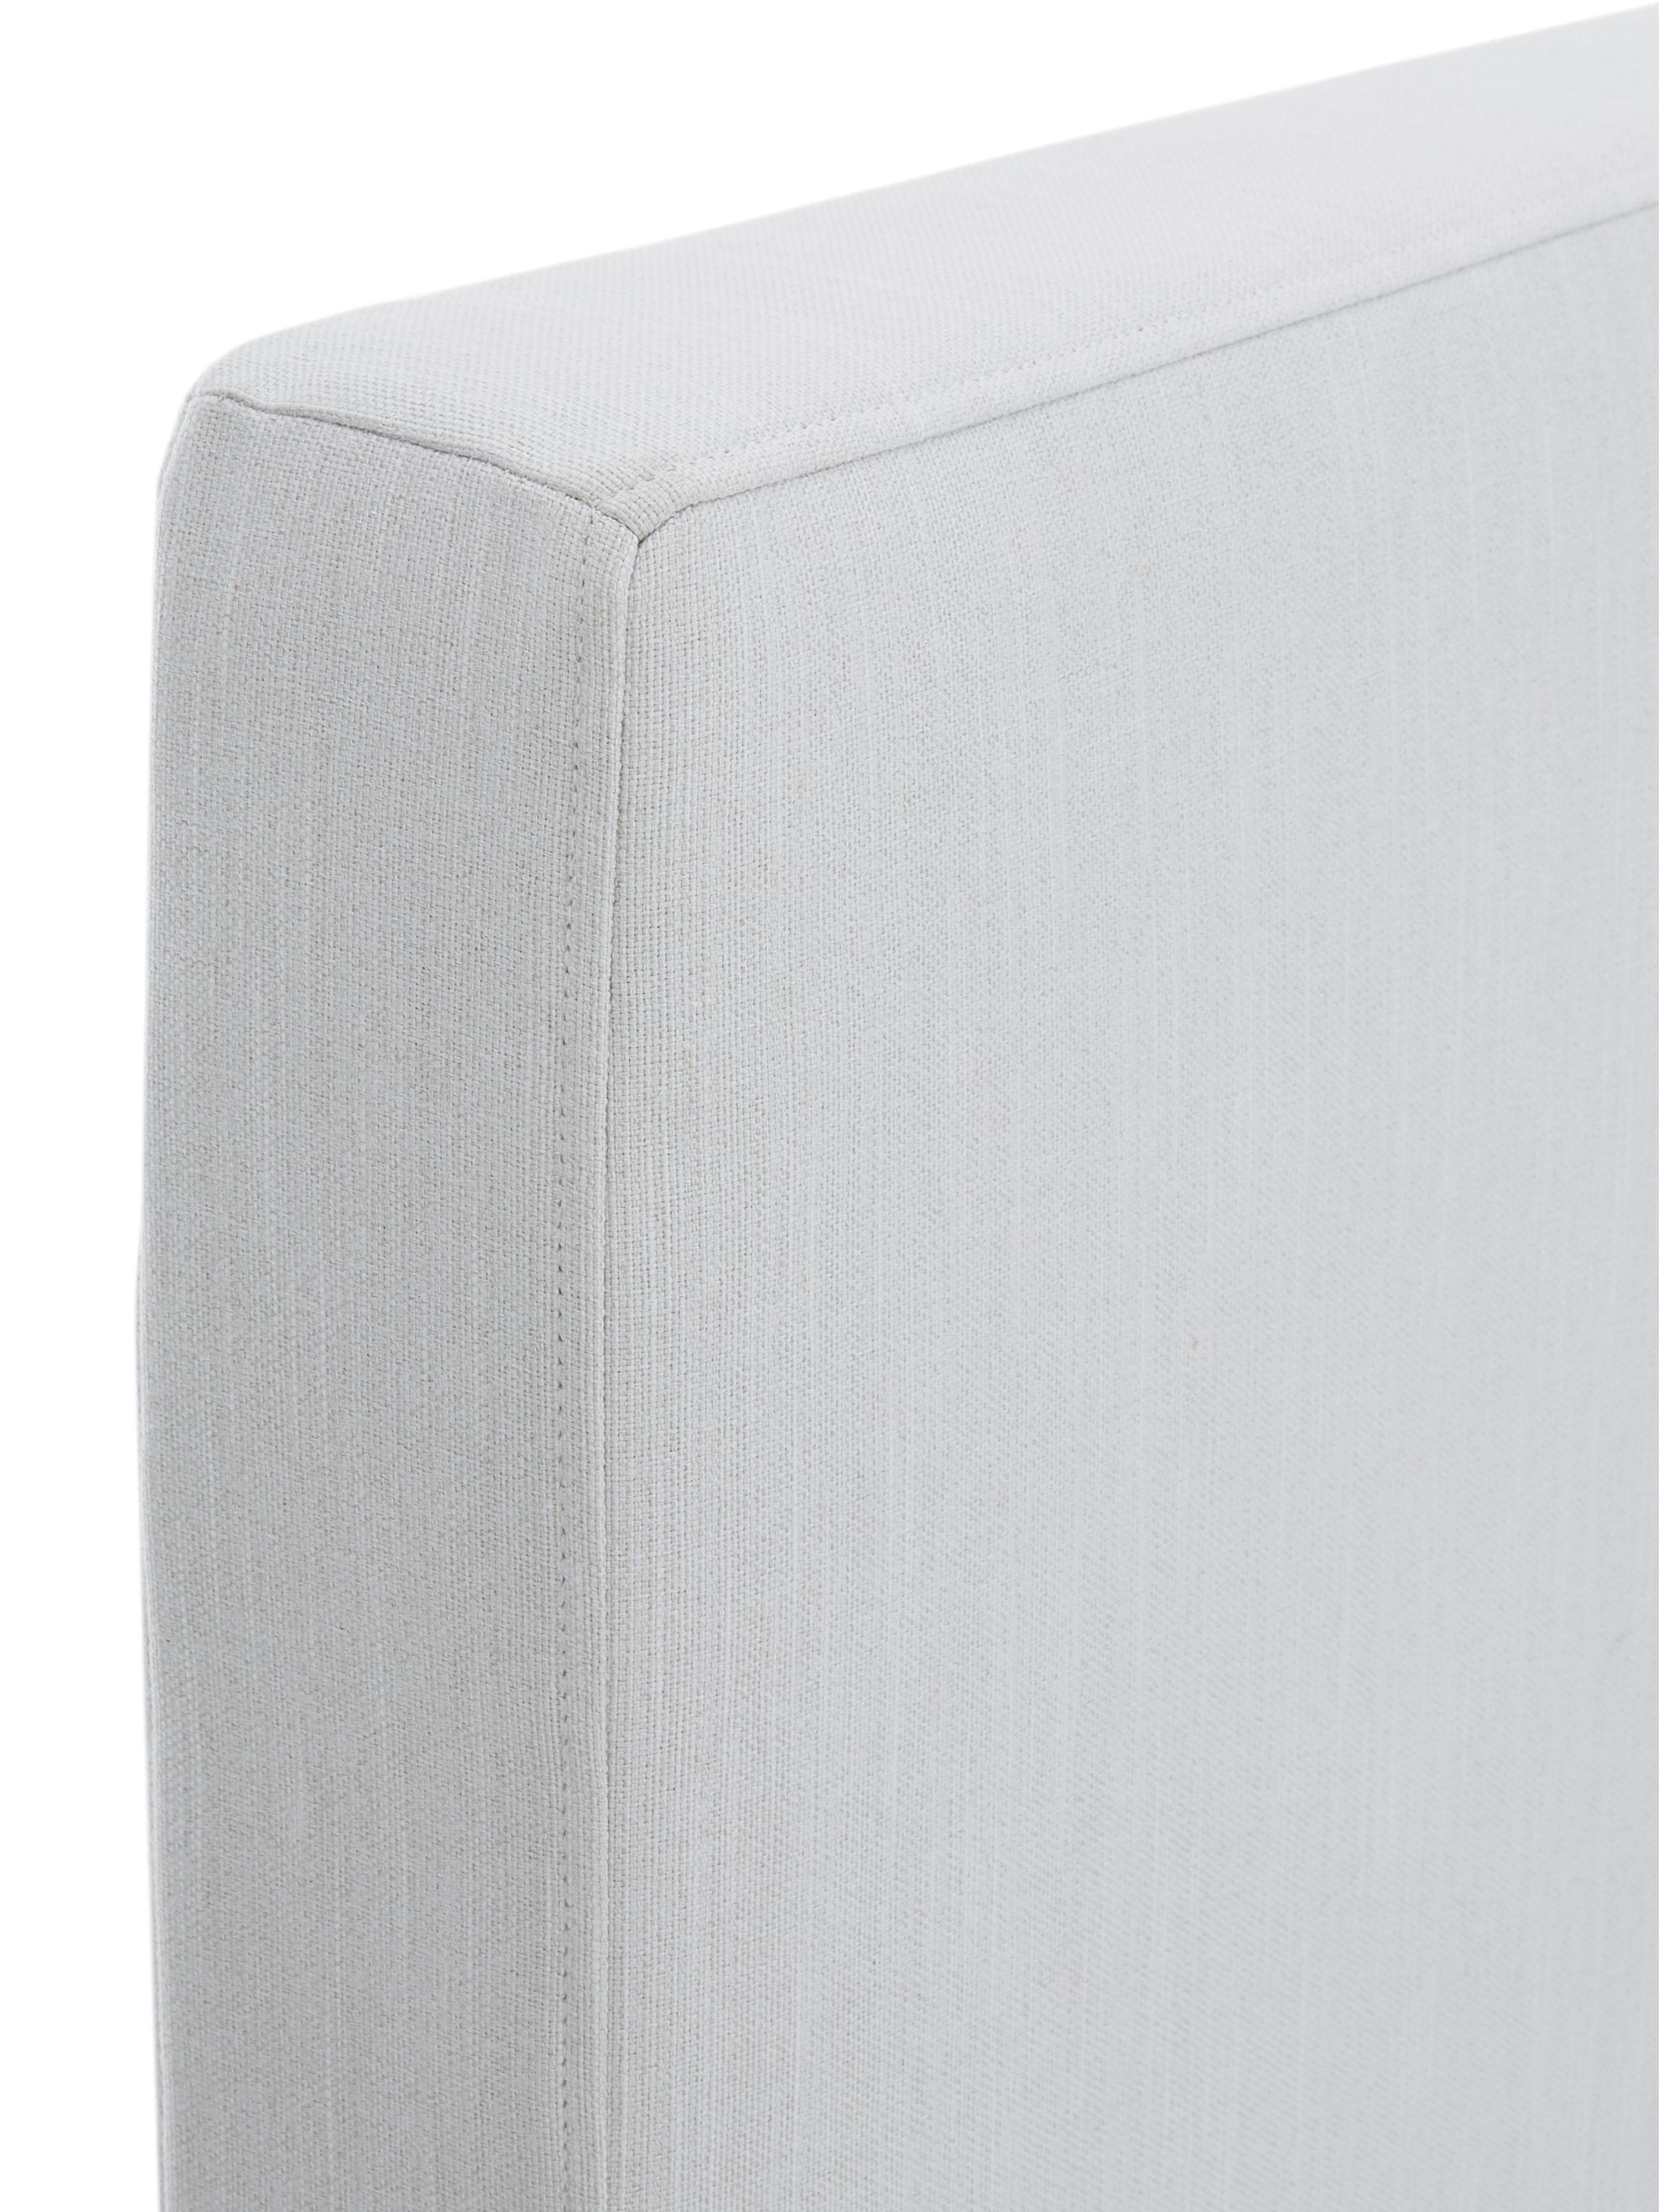 Polsterbett Peace, Korpus: Massives Kiefernholz, Füße: Metall, pulverbeschichtet, Bezug: Polyester (Strukturstoff), Webstoff Hellgrau, 200 x 200 cm